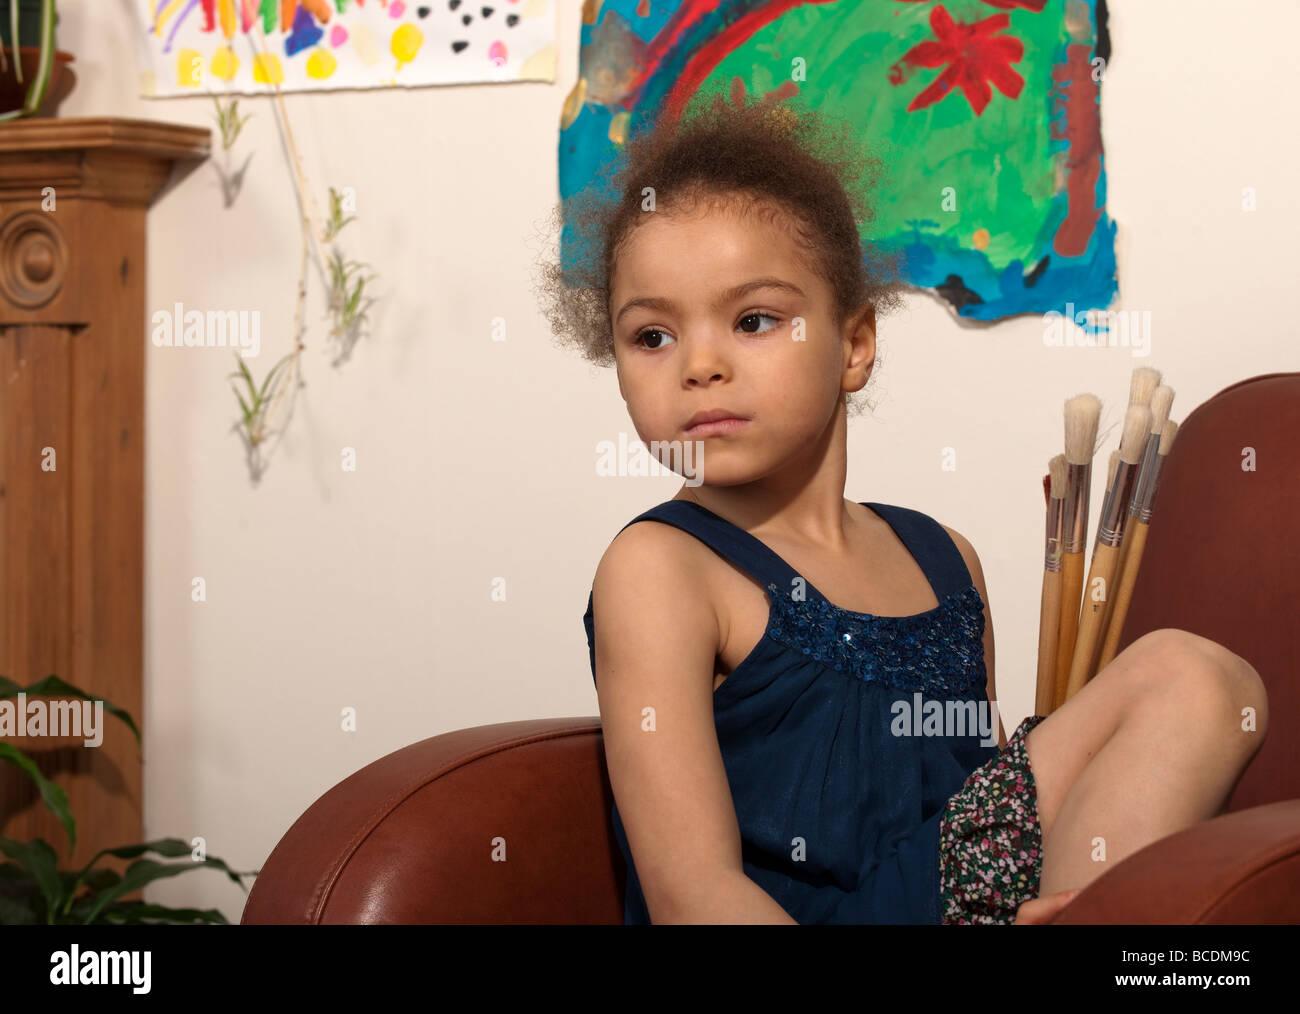 Niña con un pincel de pintar imágenes Foto de stock